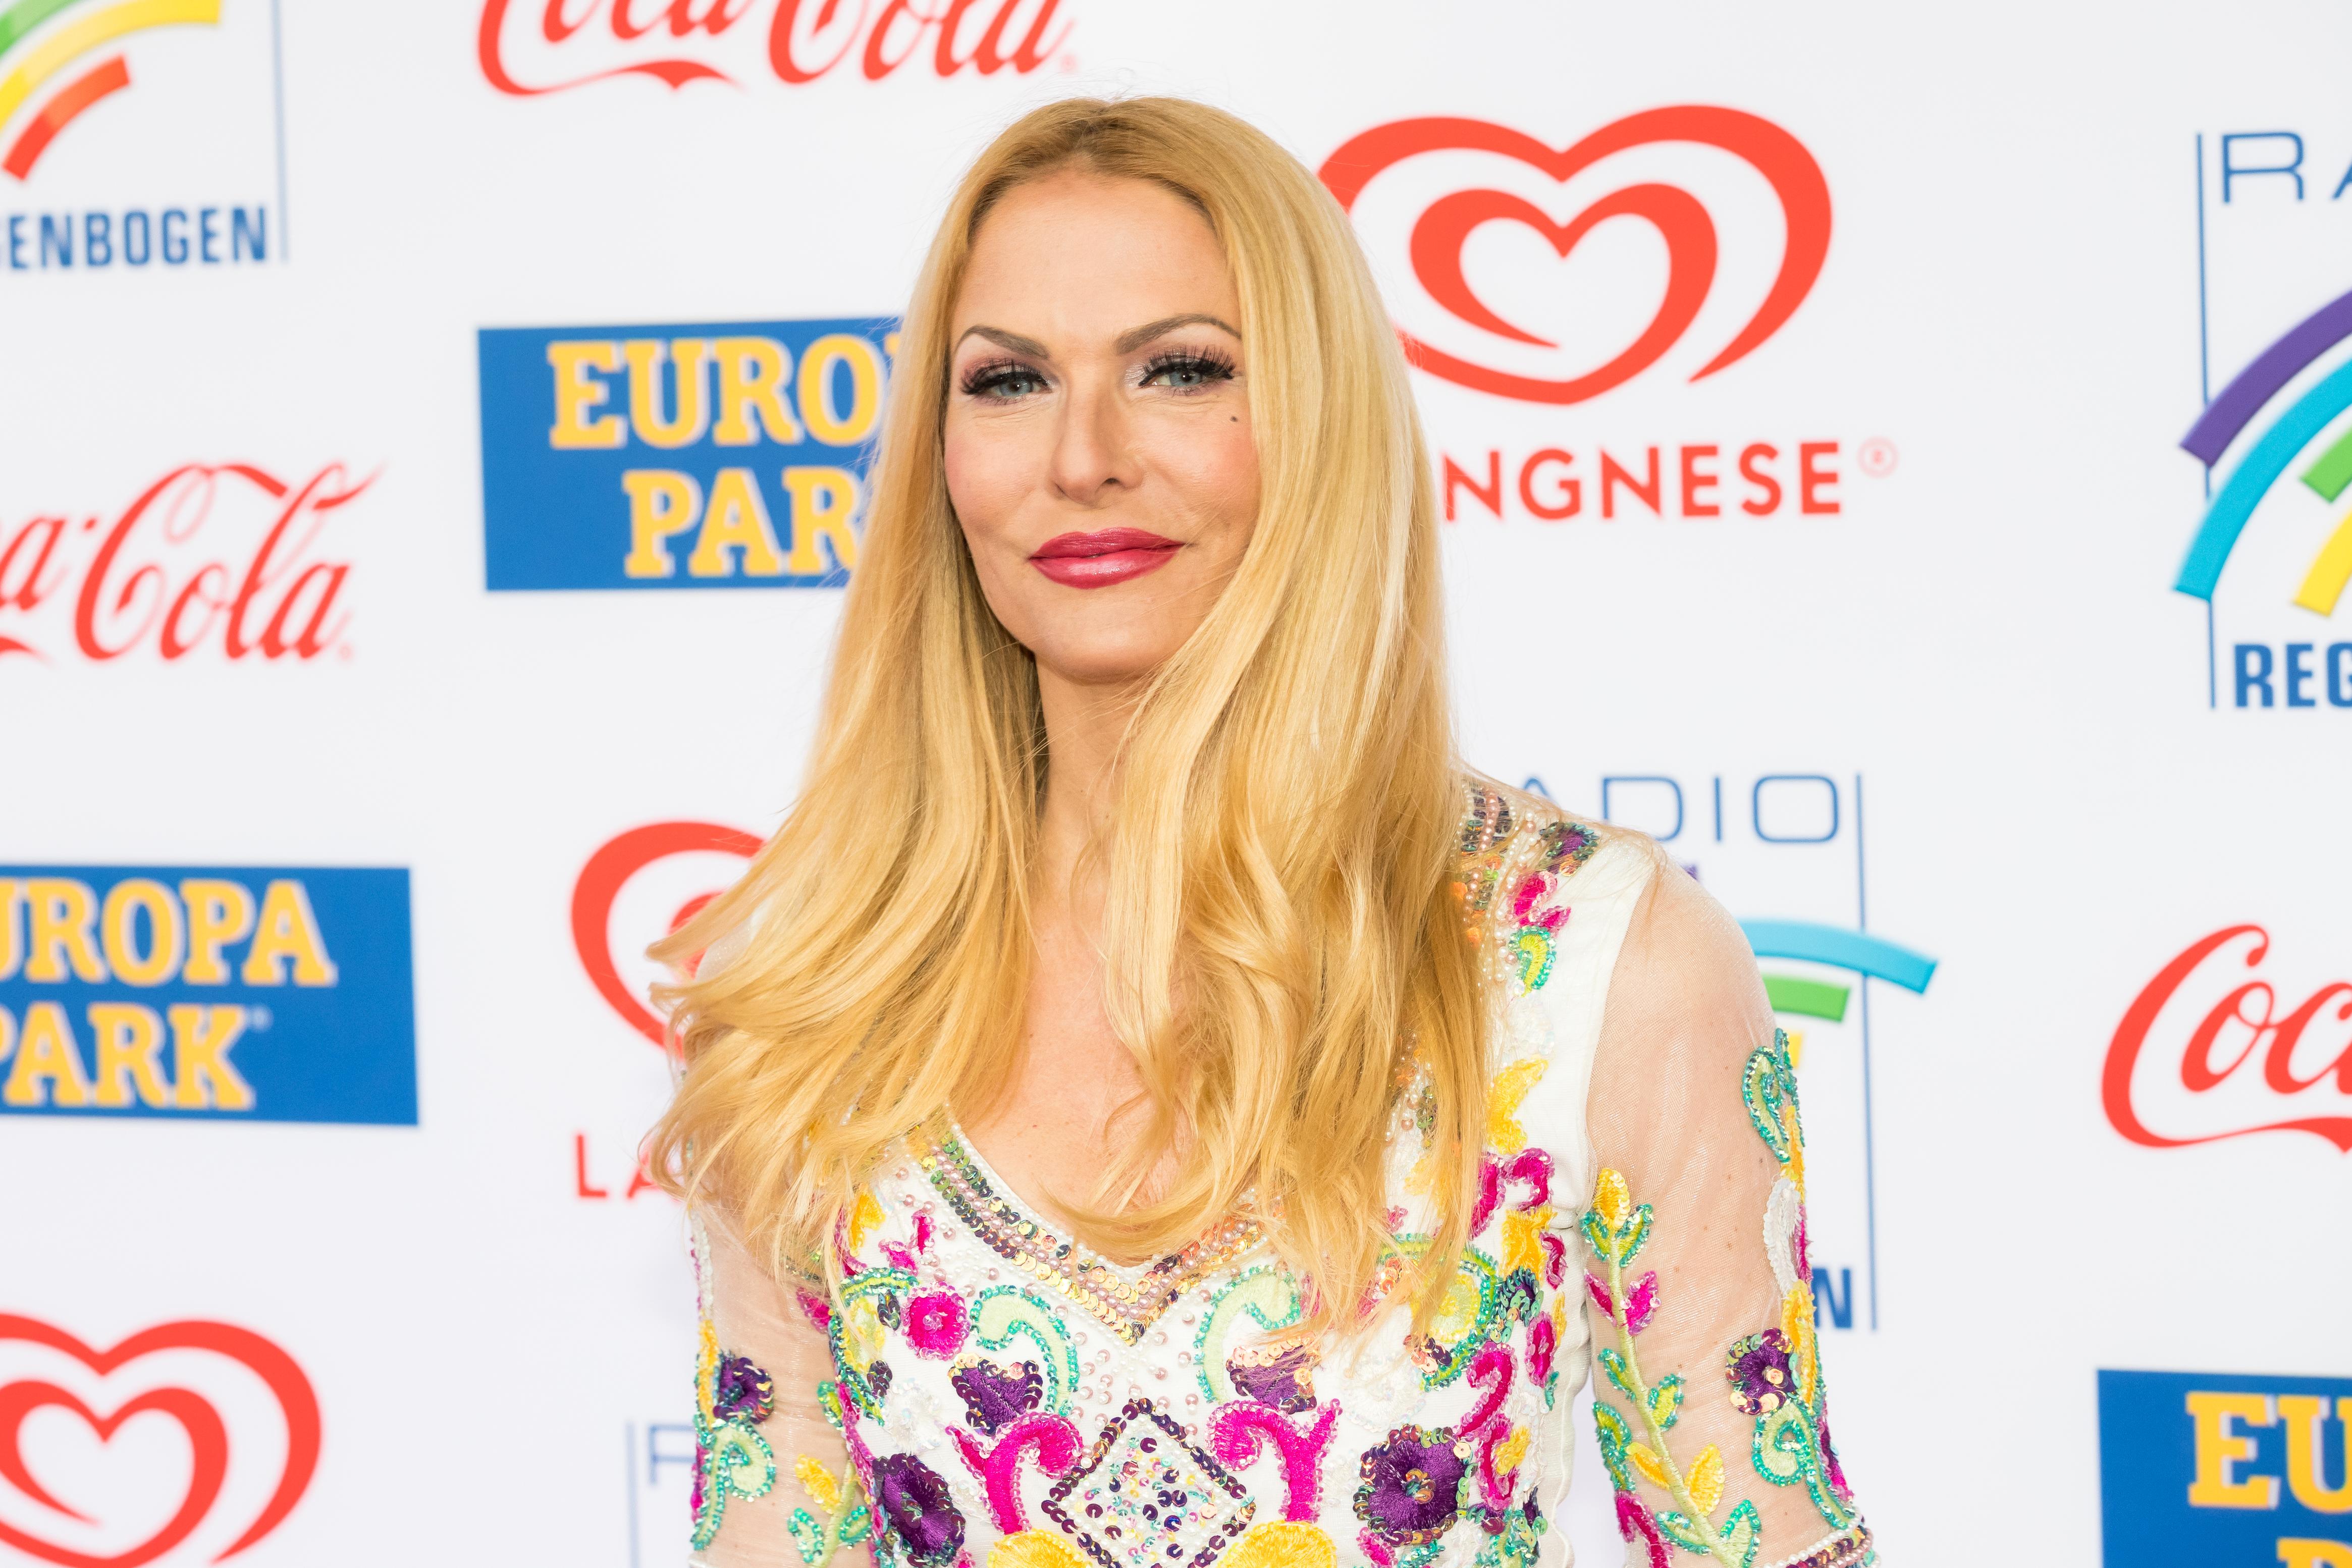 Er 46-år gammel 177 cm høj Sonya Kraus i 2020